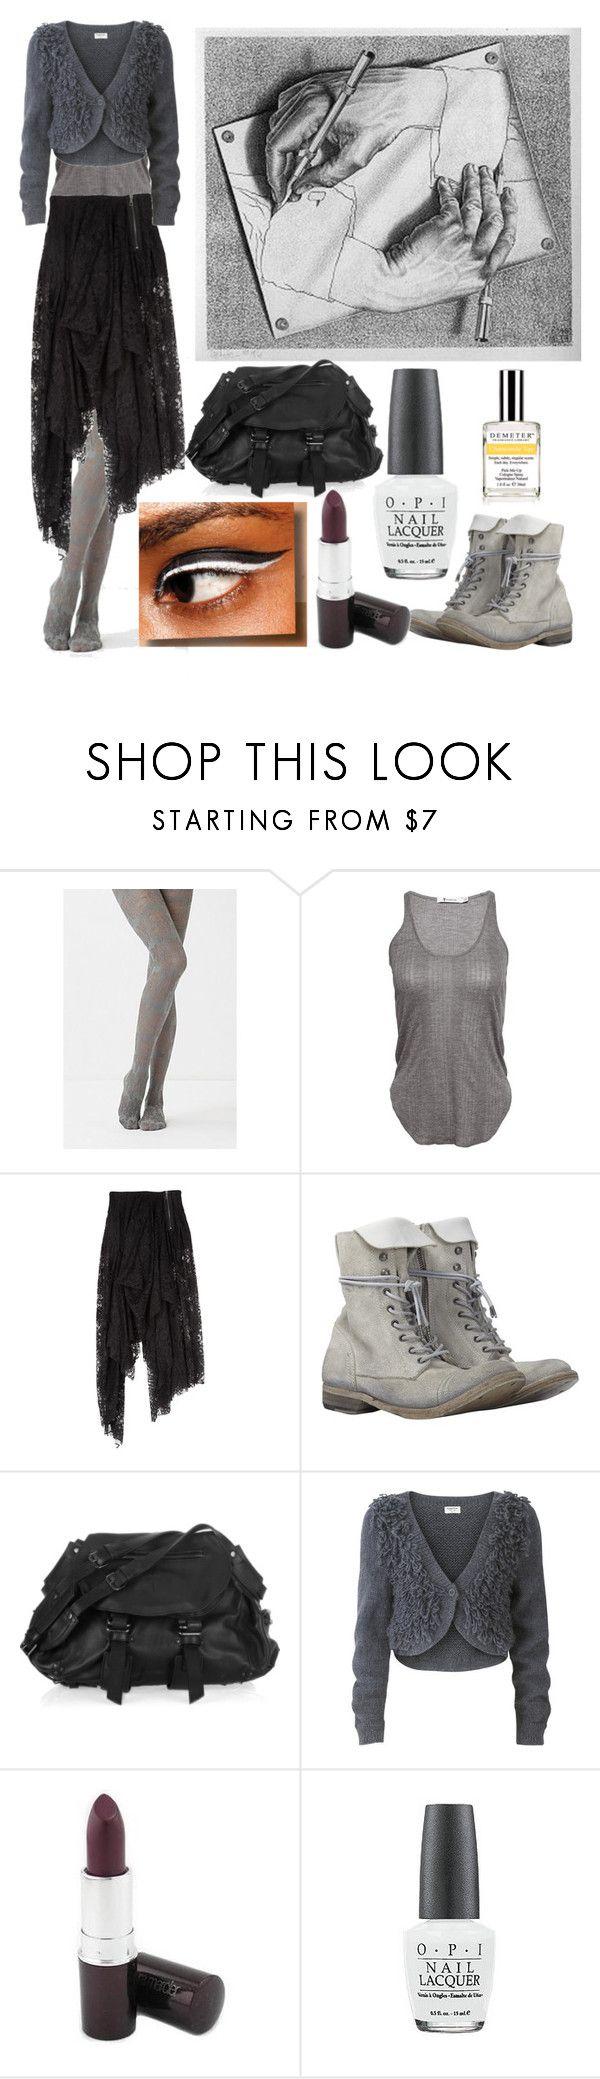 M.c.escher clipart shoe Anthropologie mc Pinterest on featuring